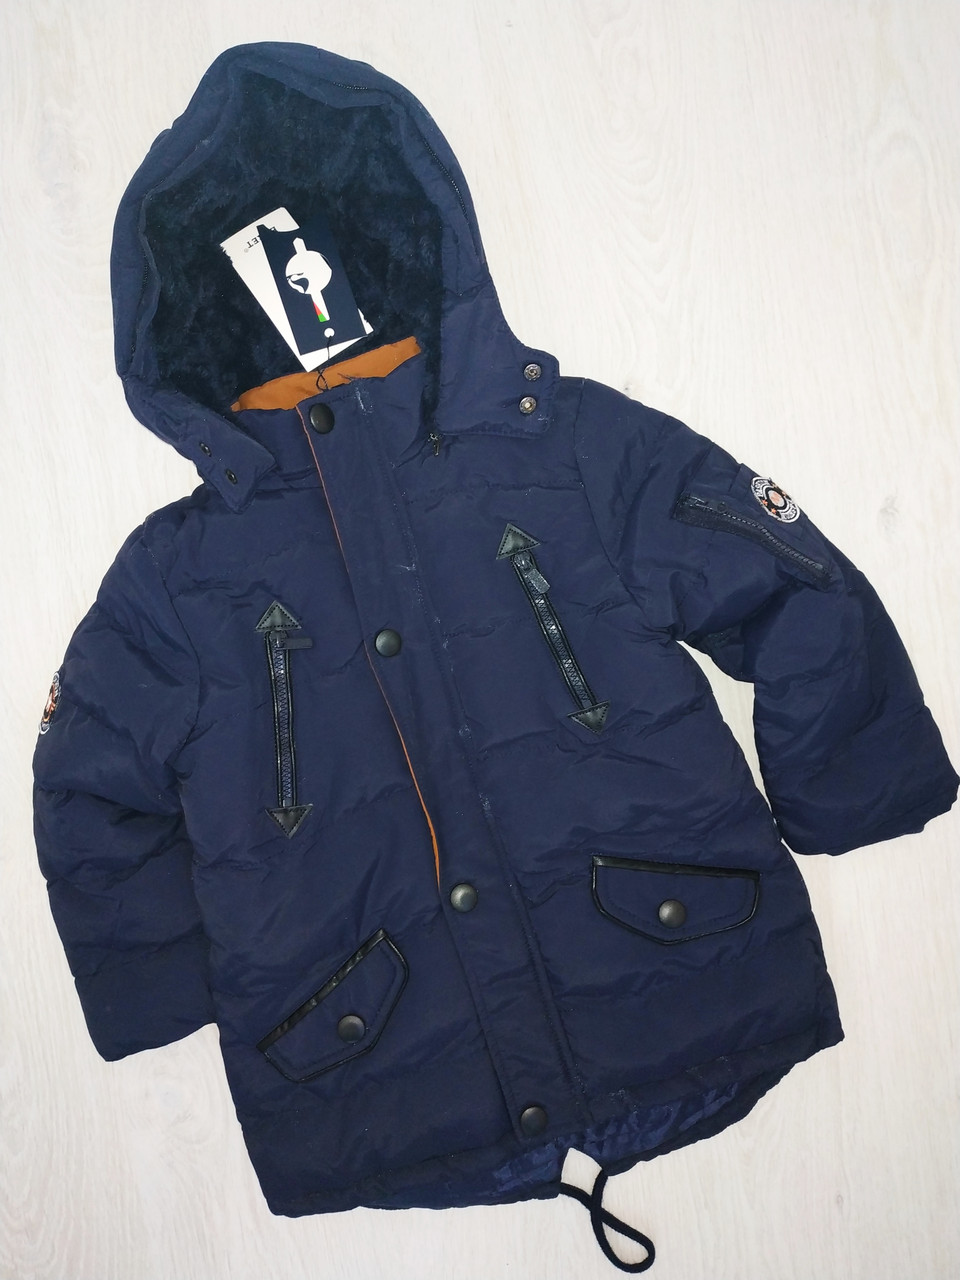 Куртка на меху для мальчика, евро-зима, Венгрия , Egret, 98  рр., арт. B61116,